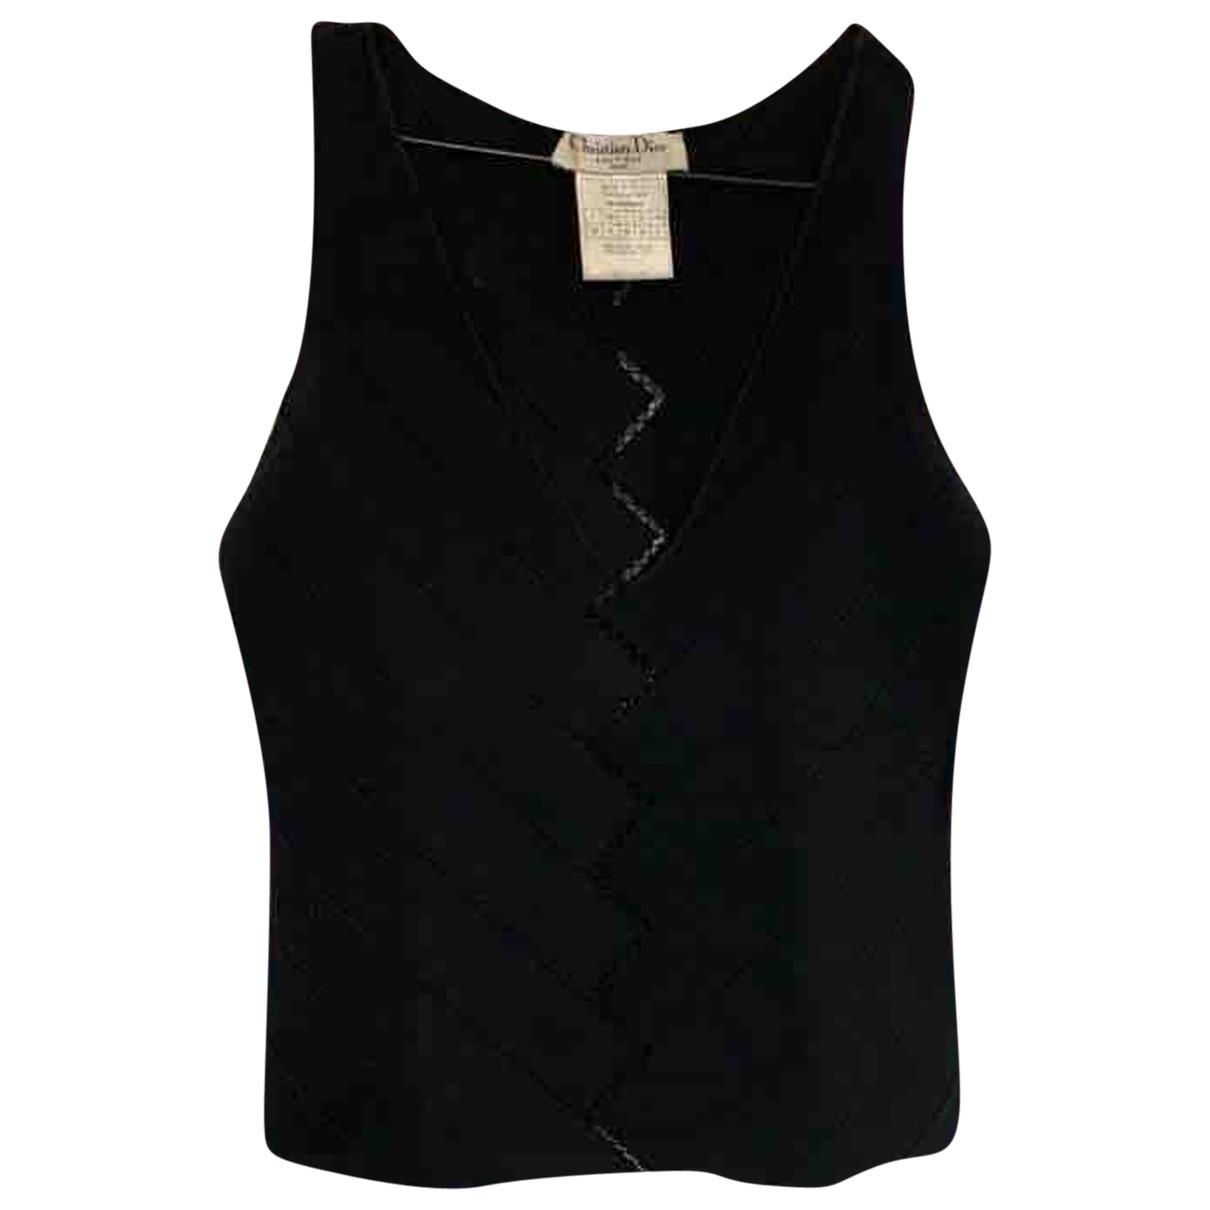 Dior \N Black  top for Women 36 FR